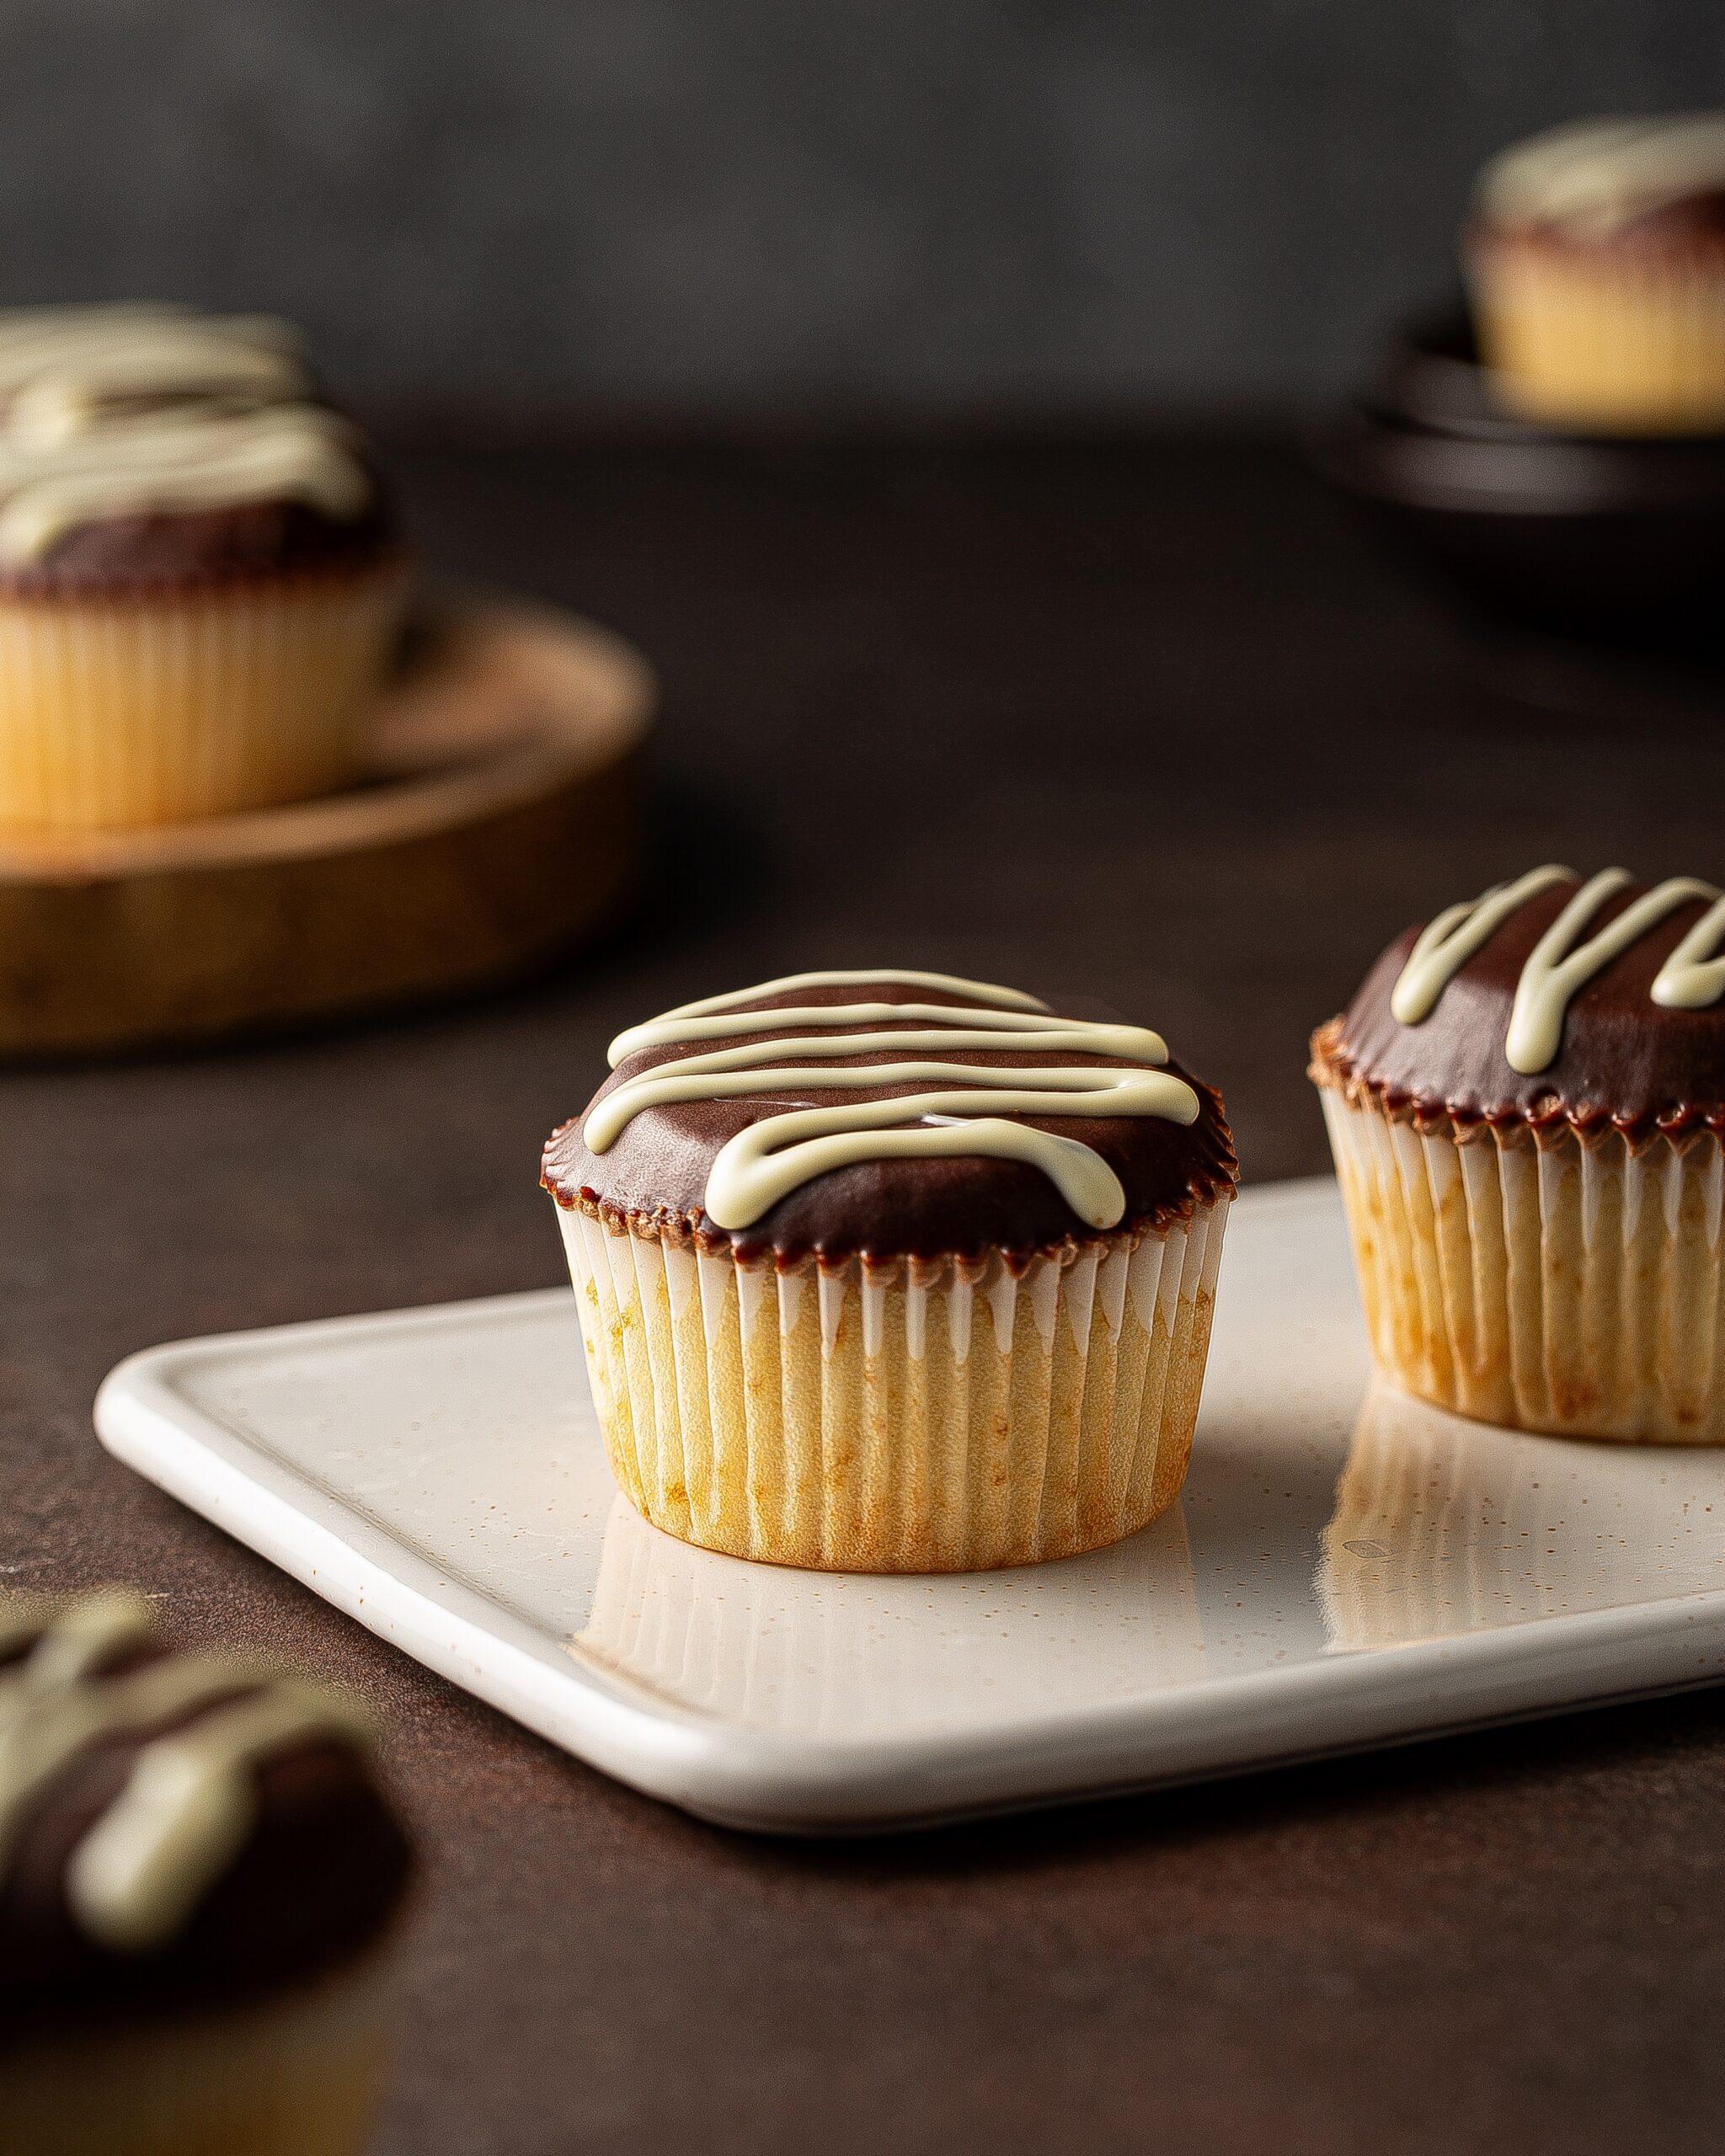 sugar-daddys-boston-cream-cupcakes